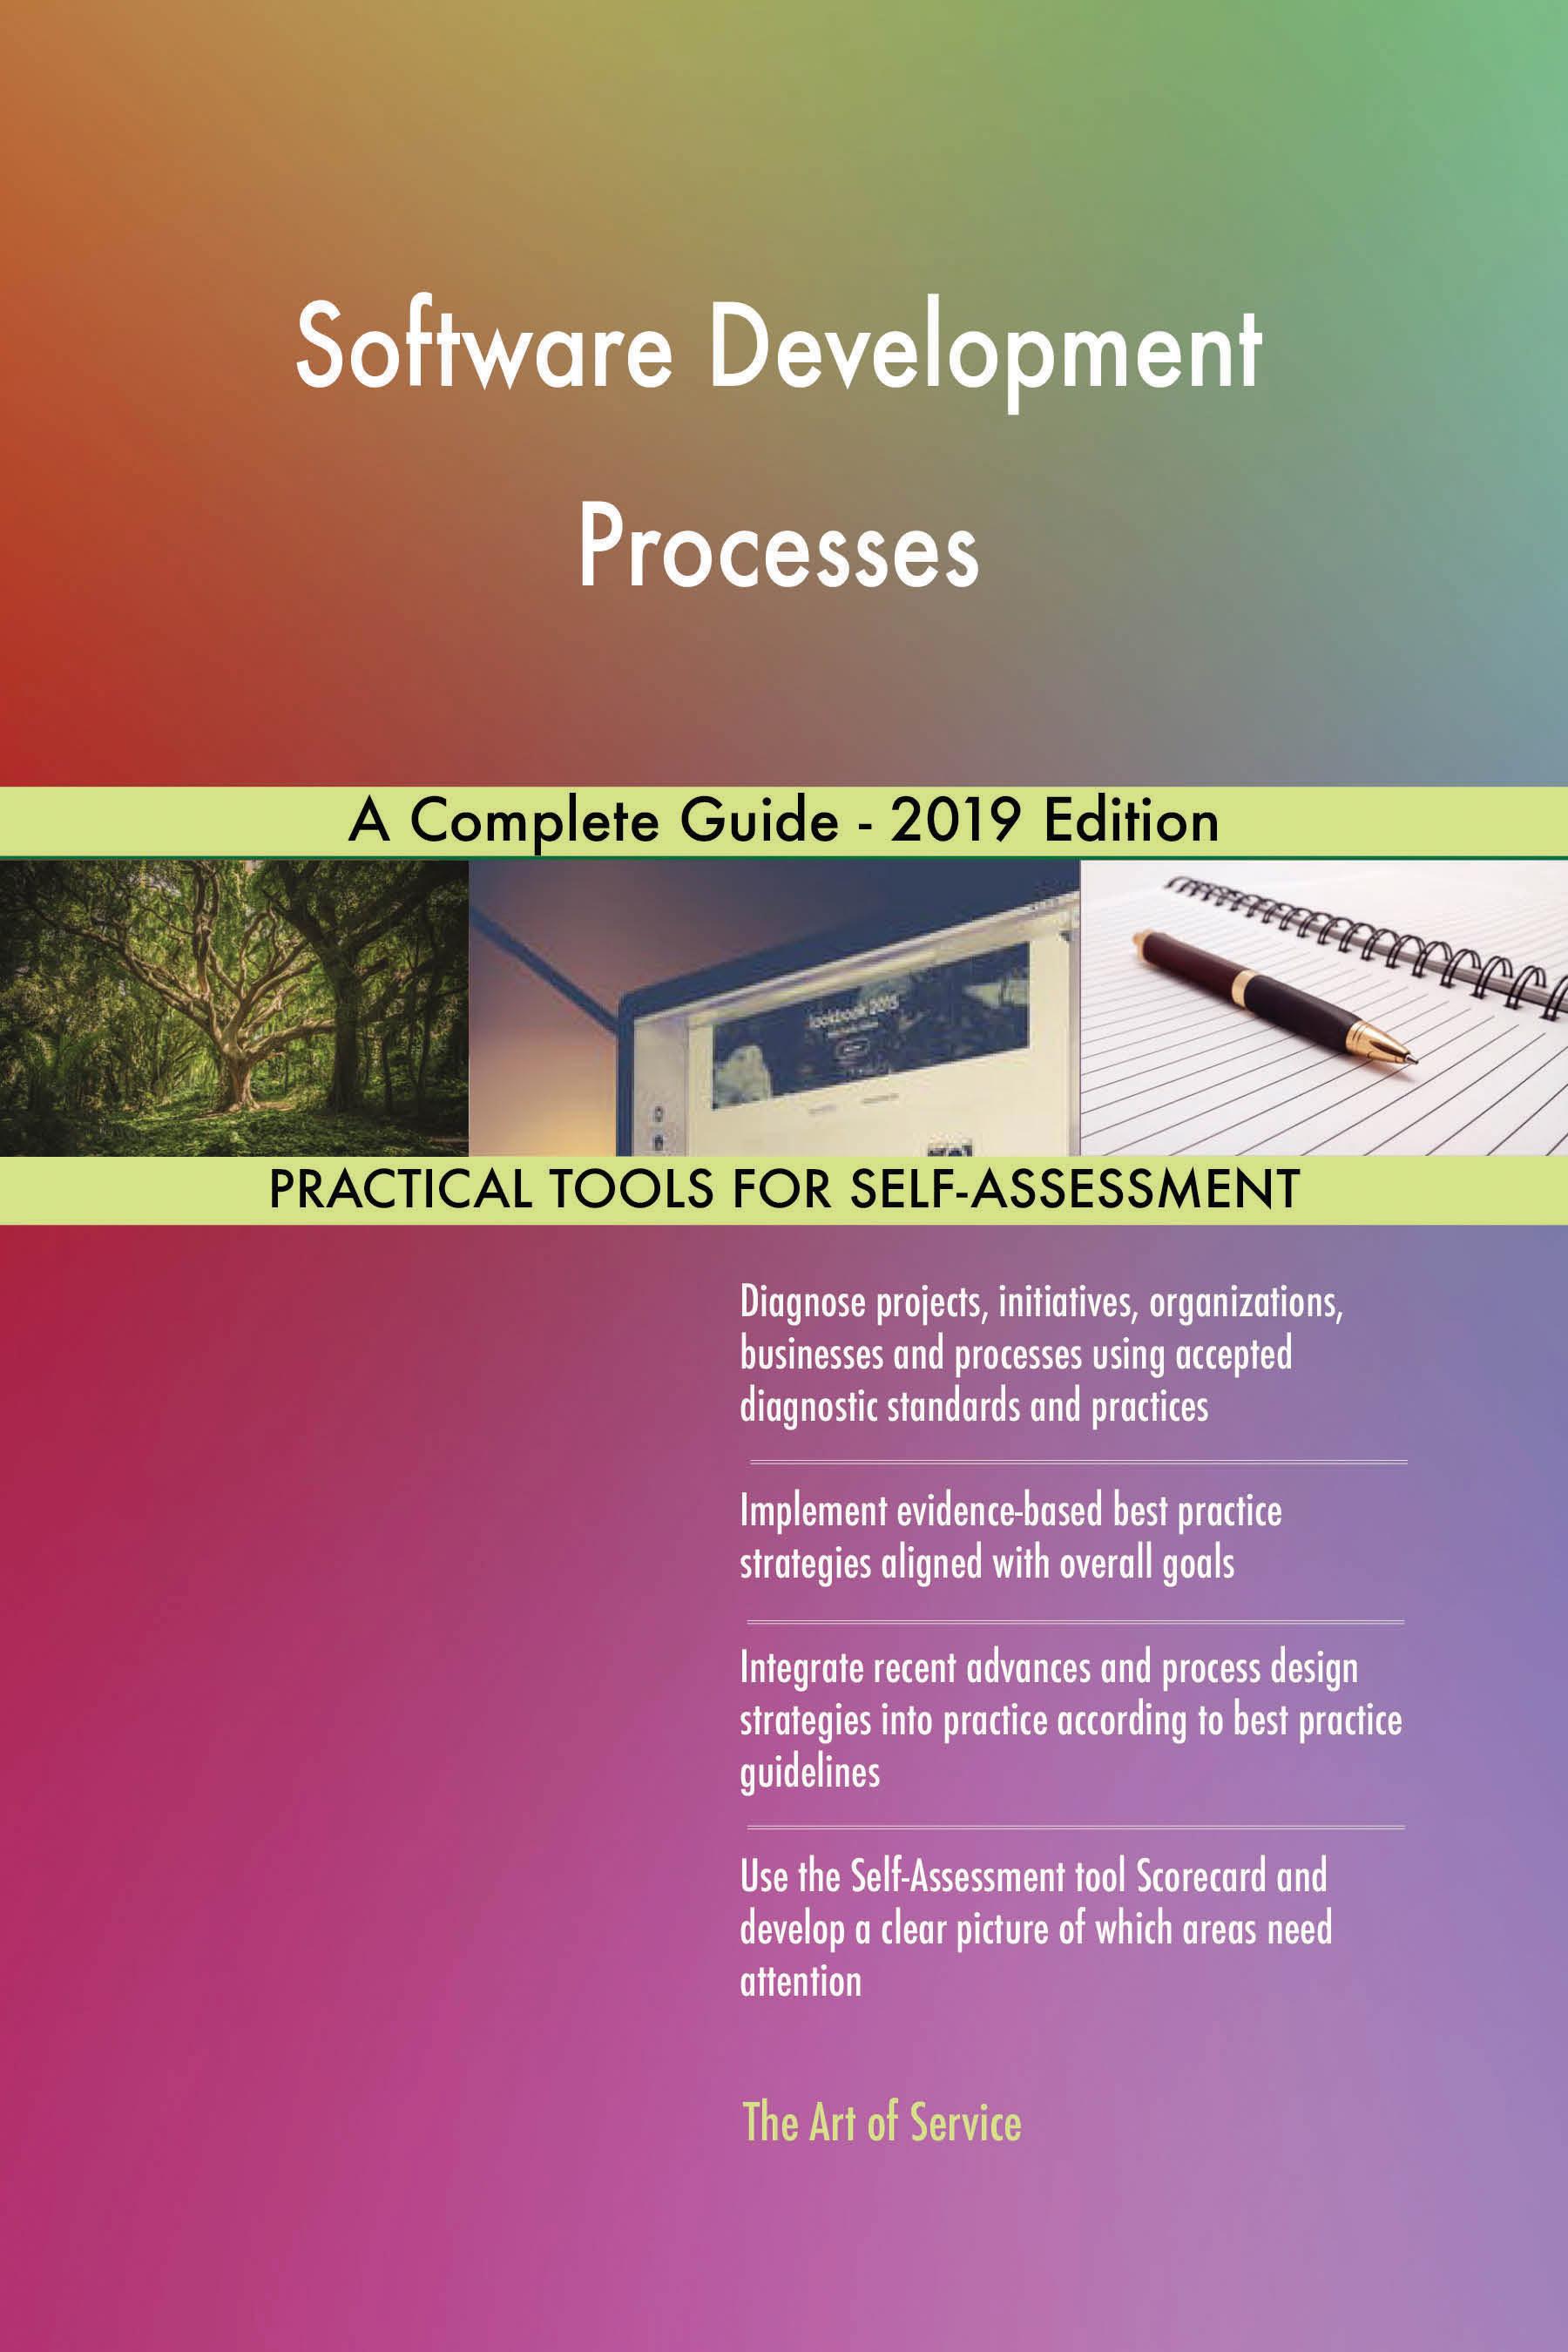 Software Development Processes A Complete Guide - 2019